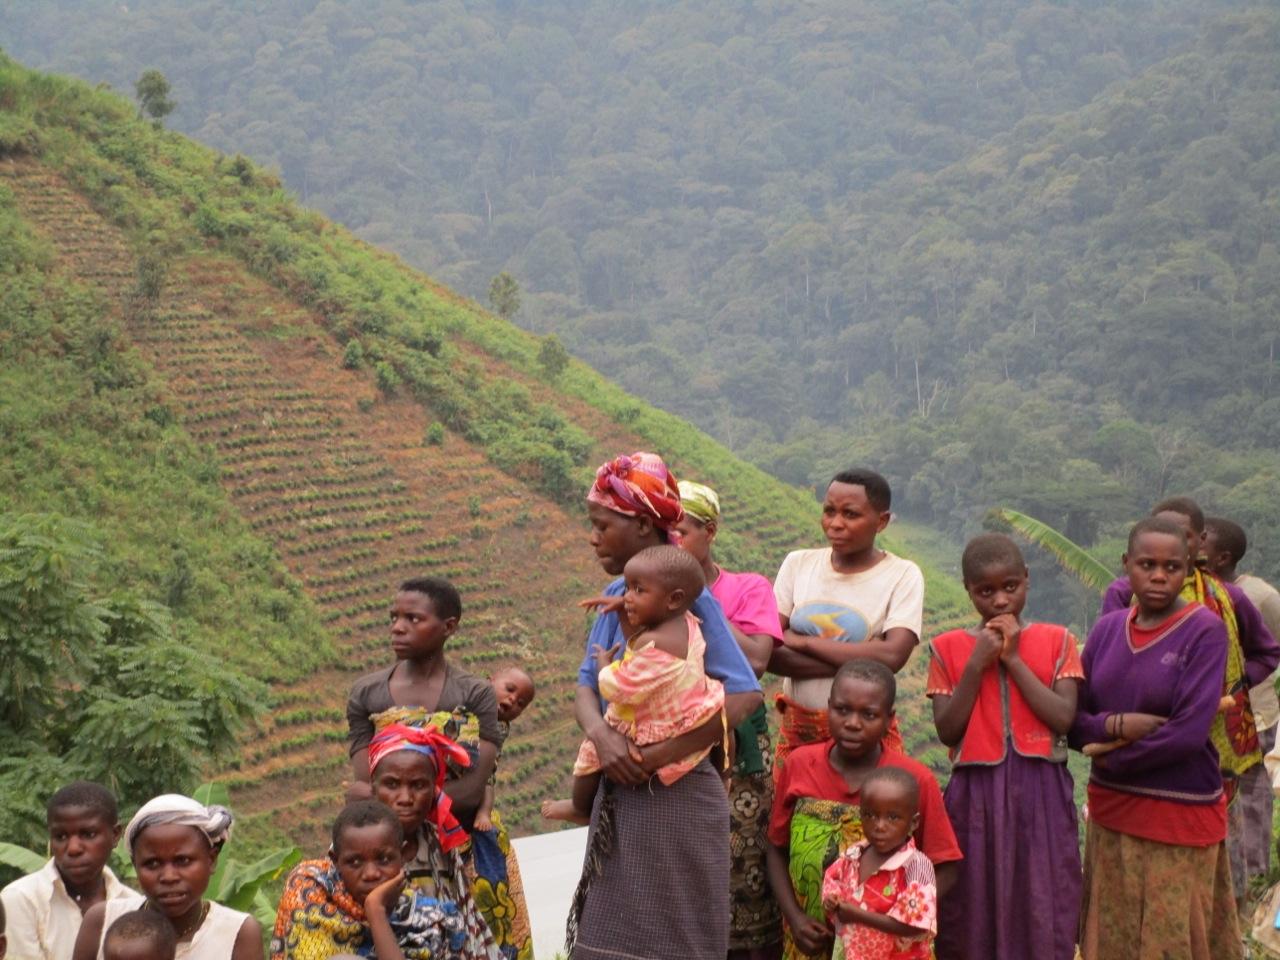 Uganda Batwa community on edge of Bwindi National Park, Credit - Dilys Roe